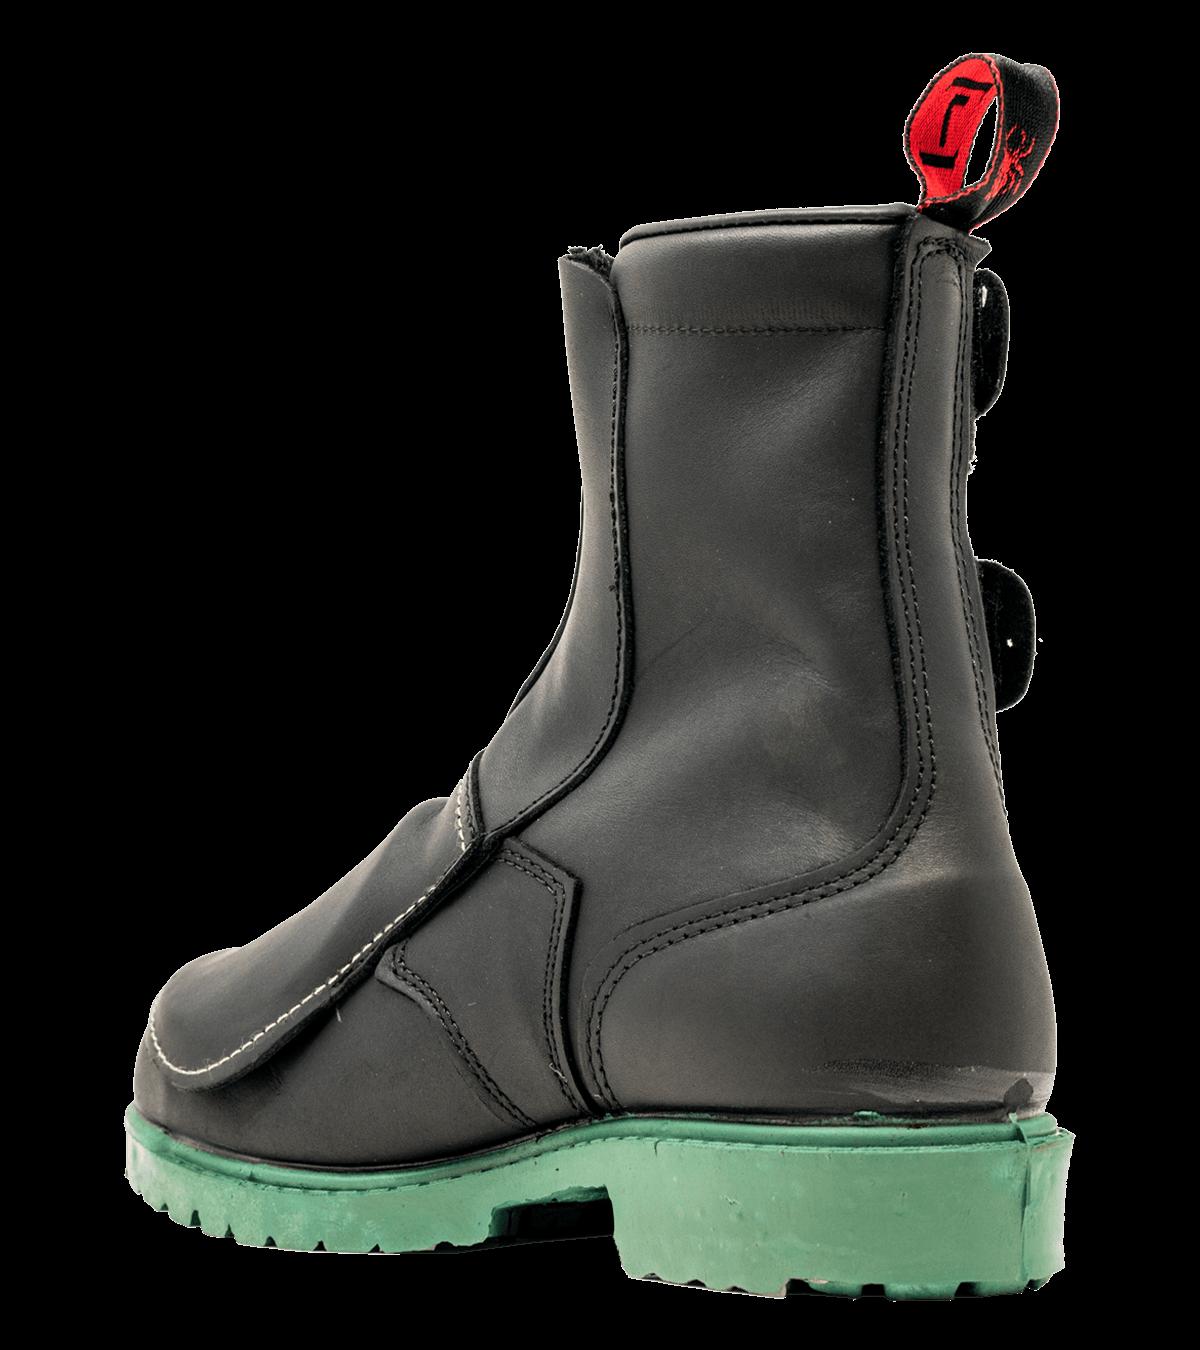 08a94a6e32b Smelter | Redback Boots®